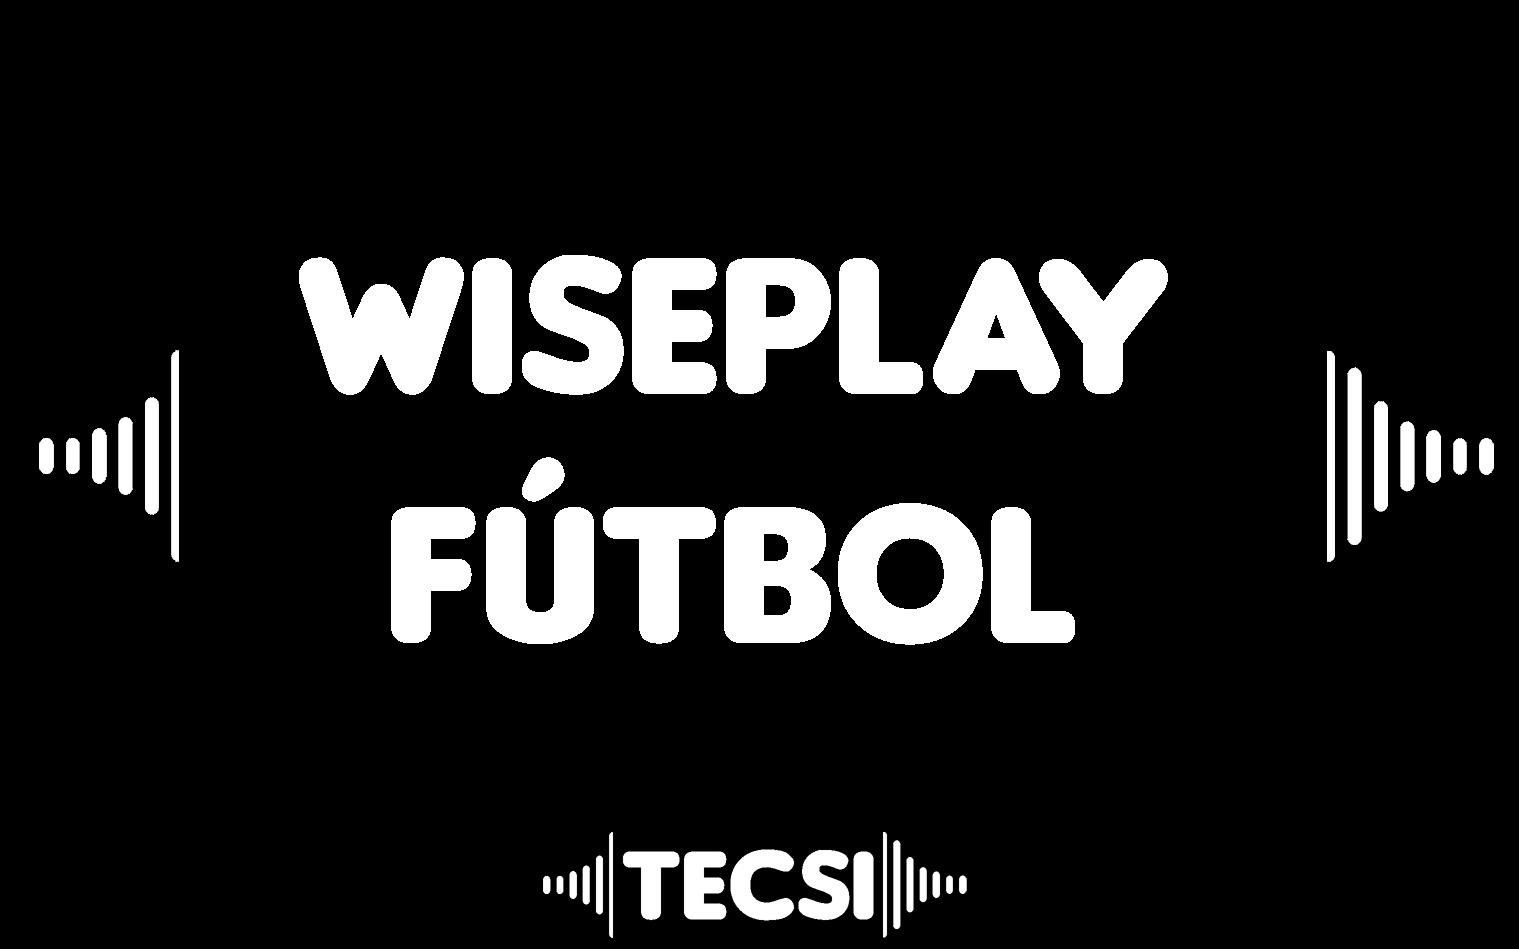 wiseplay futbol